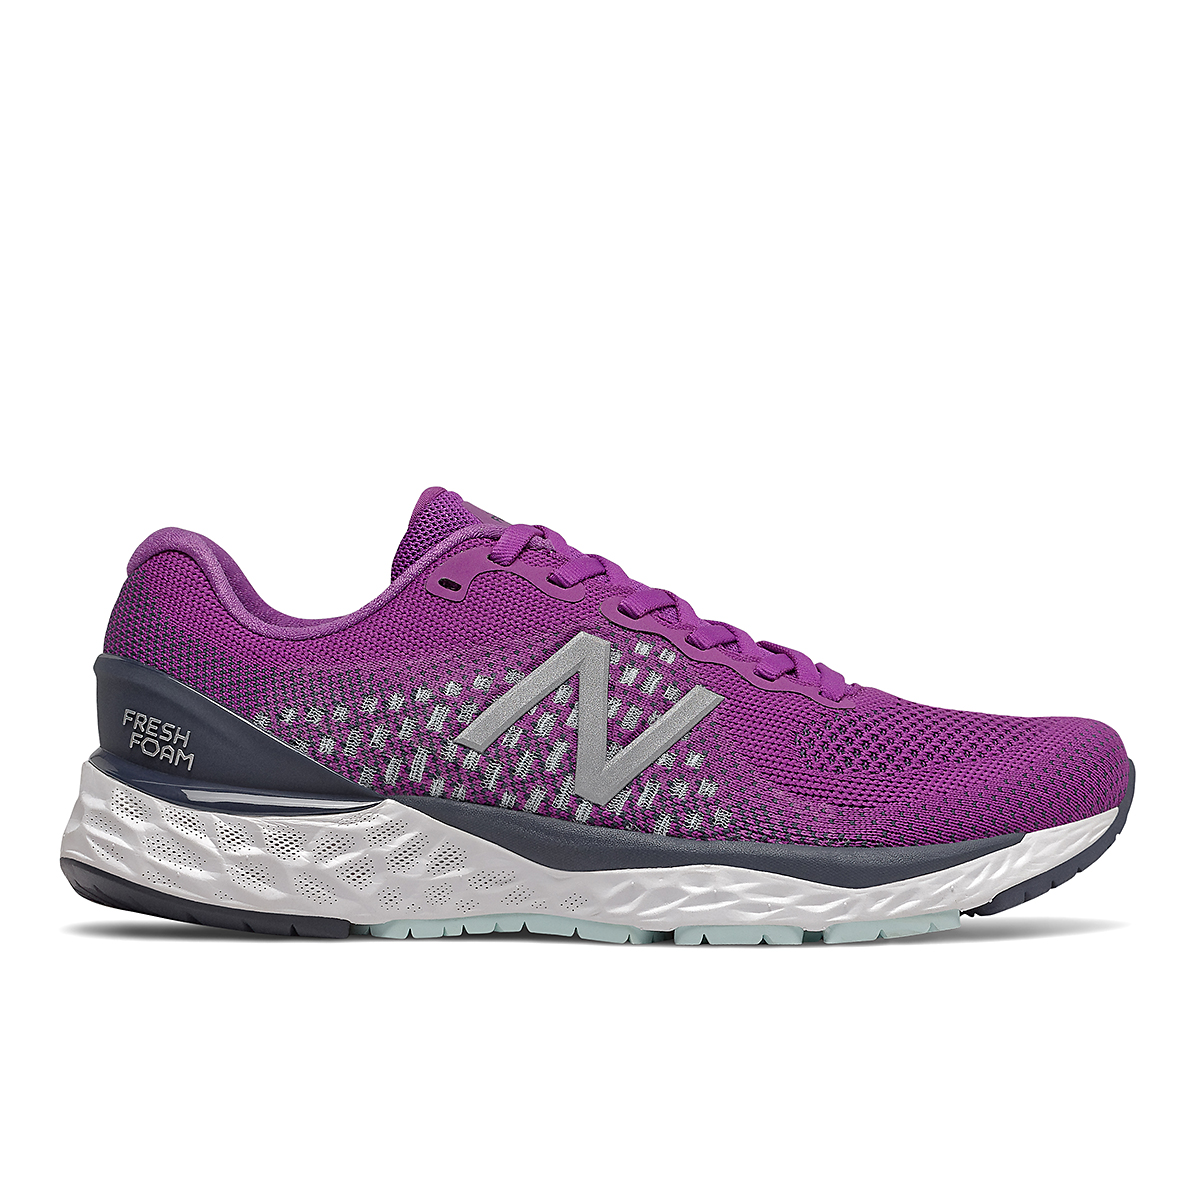 Women's New Balance 880V10 Running Shoe - Color: Plum - Size: 5 - Width: Narrow, Plum, large, image 1